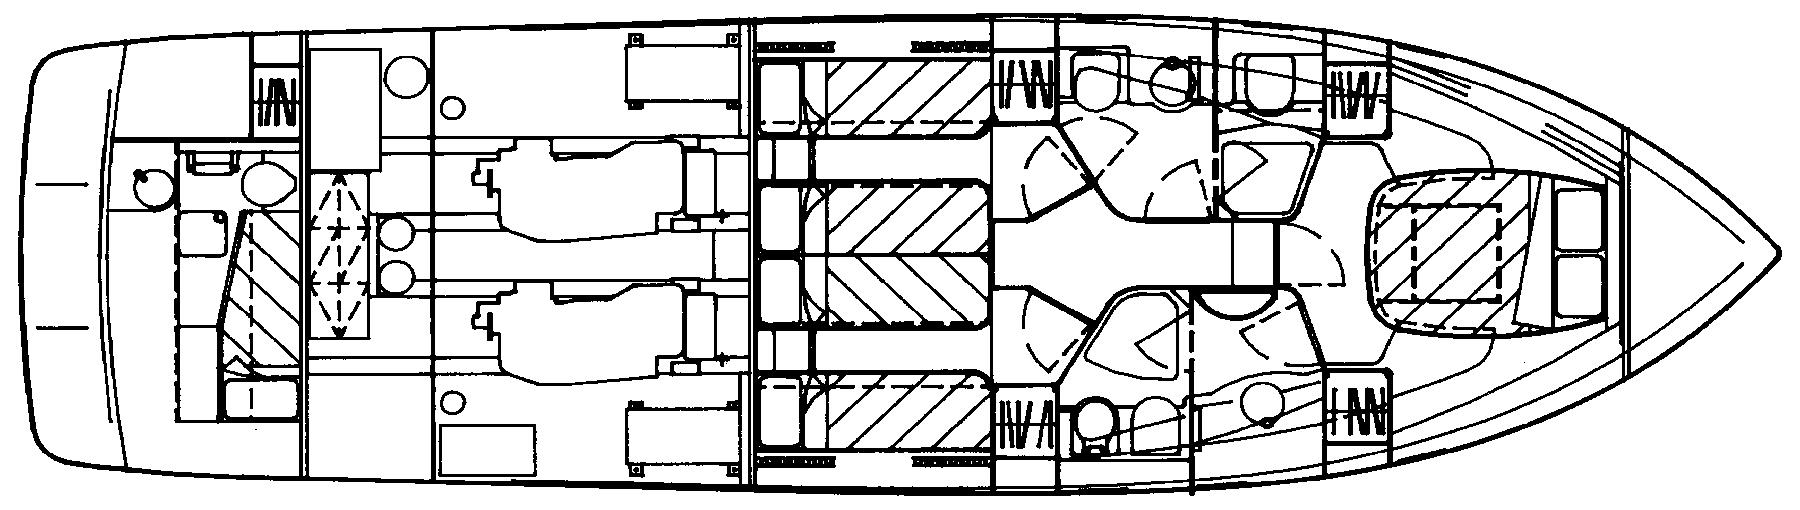 Azimut 52 Flybridge Floor Plan 2